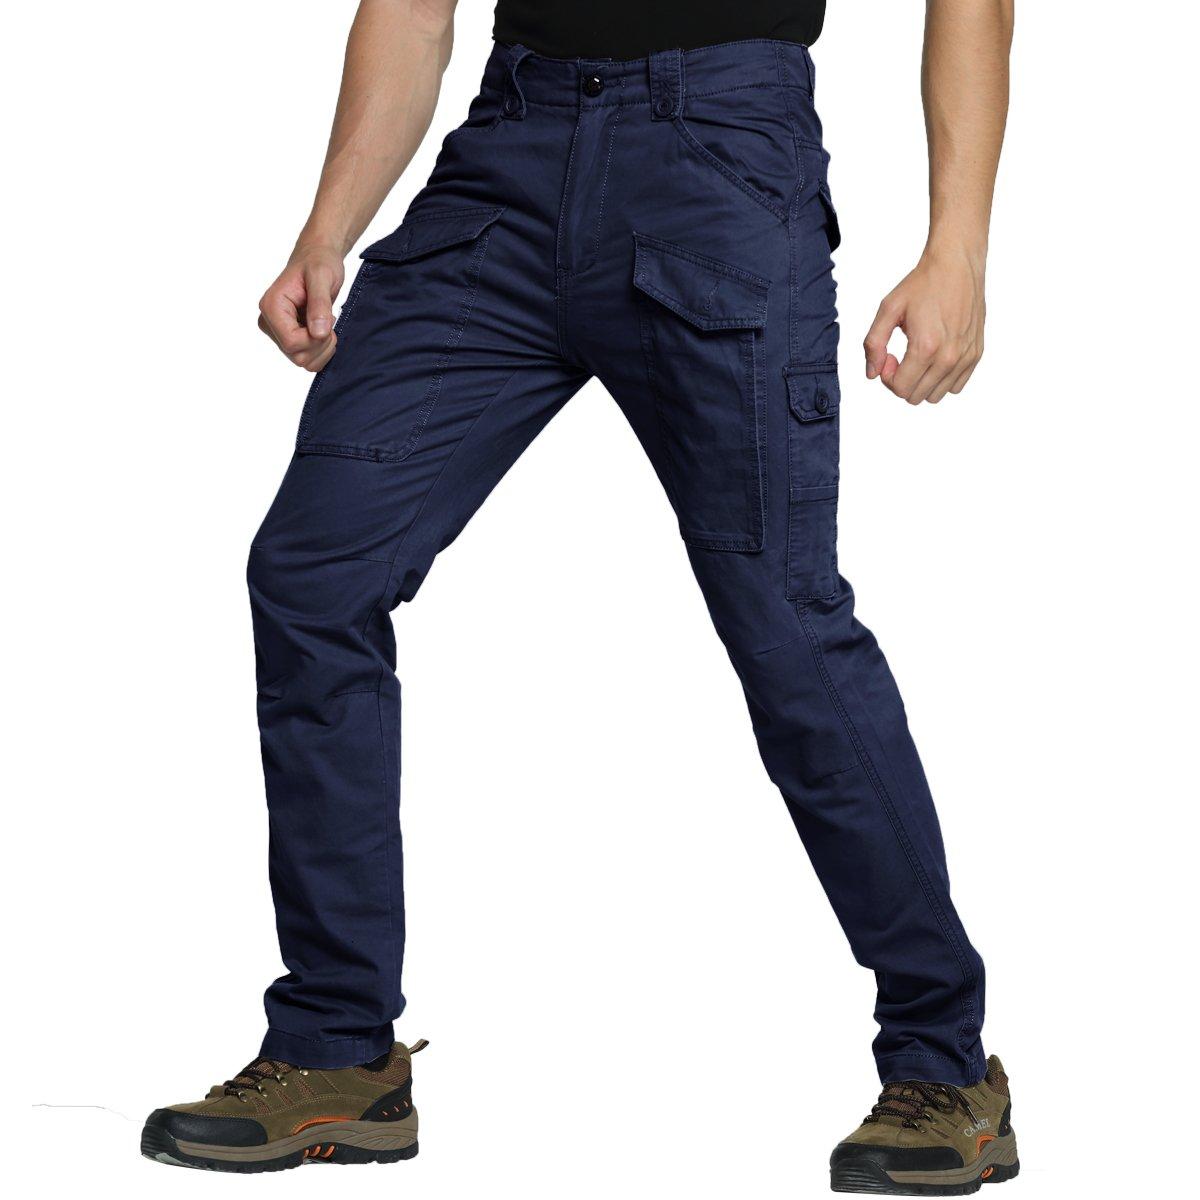 Amazon.com: VAVE Pantalones tácticos de combate para hombre ...